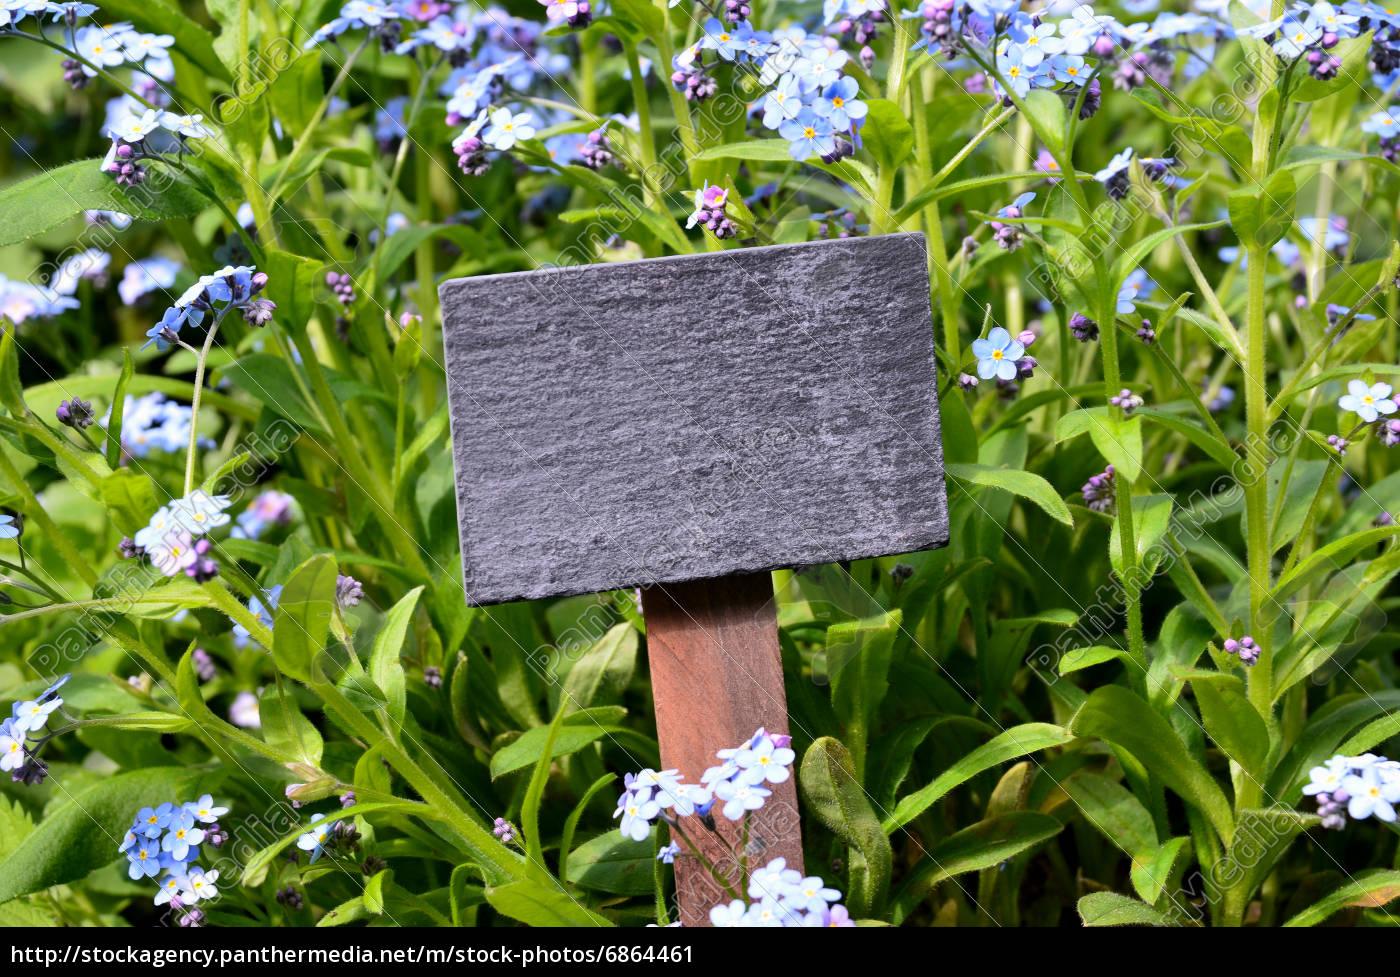 Tafel Frische Krauter Garten Lizenzfreies Bild 6864461